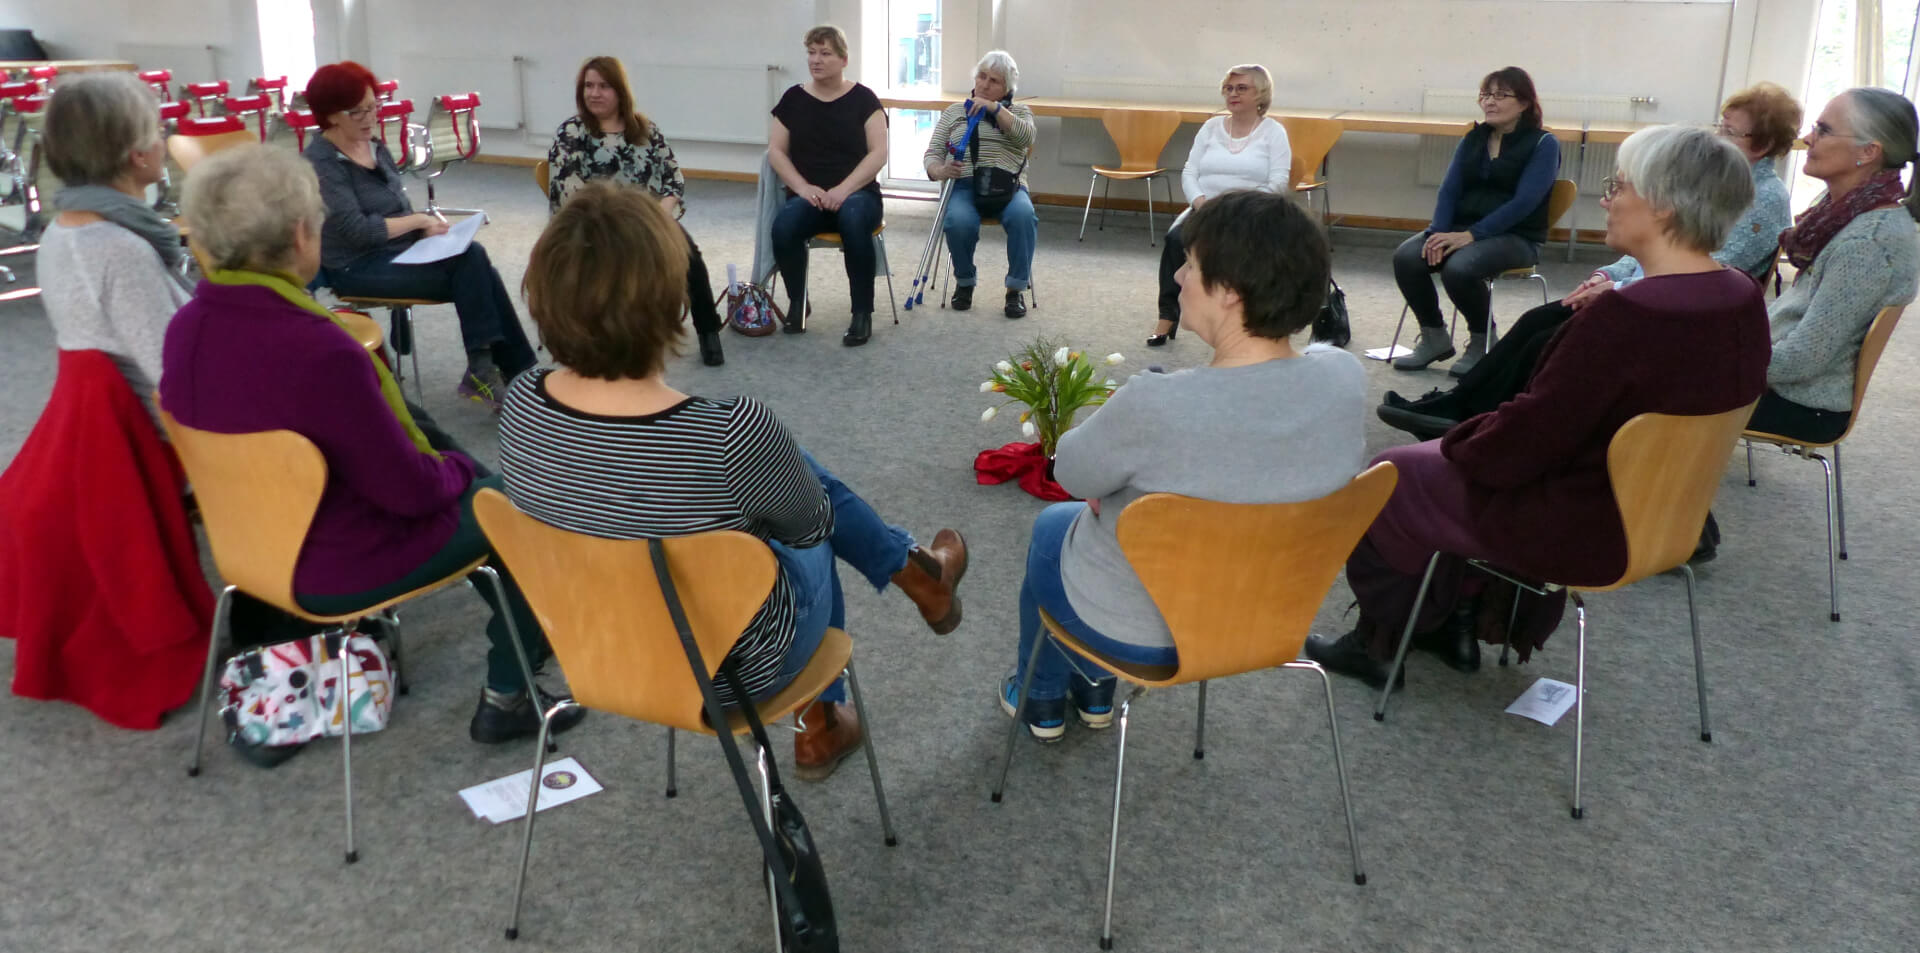 Stuhlkreis: Workshop